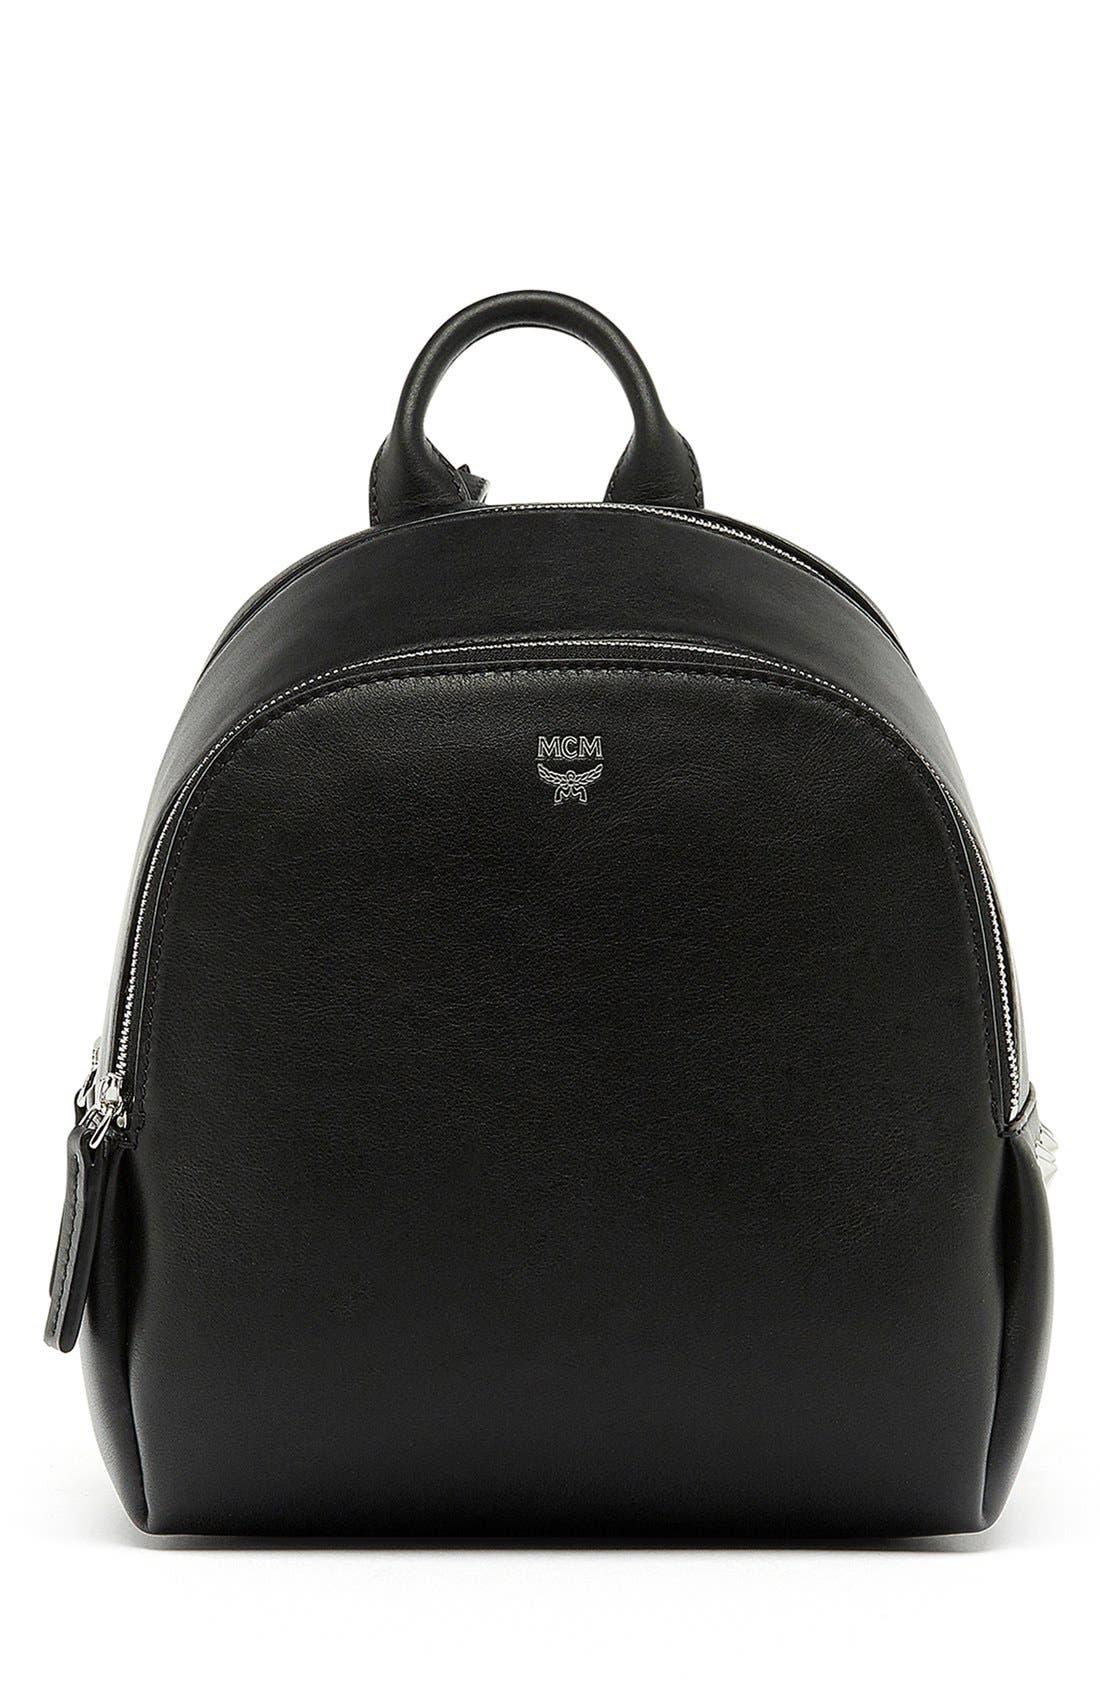 Main Image - MCM 'Mini Duchess' Leather Backpack